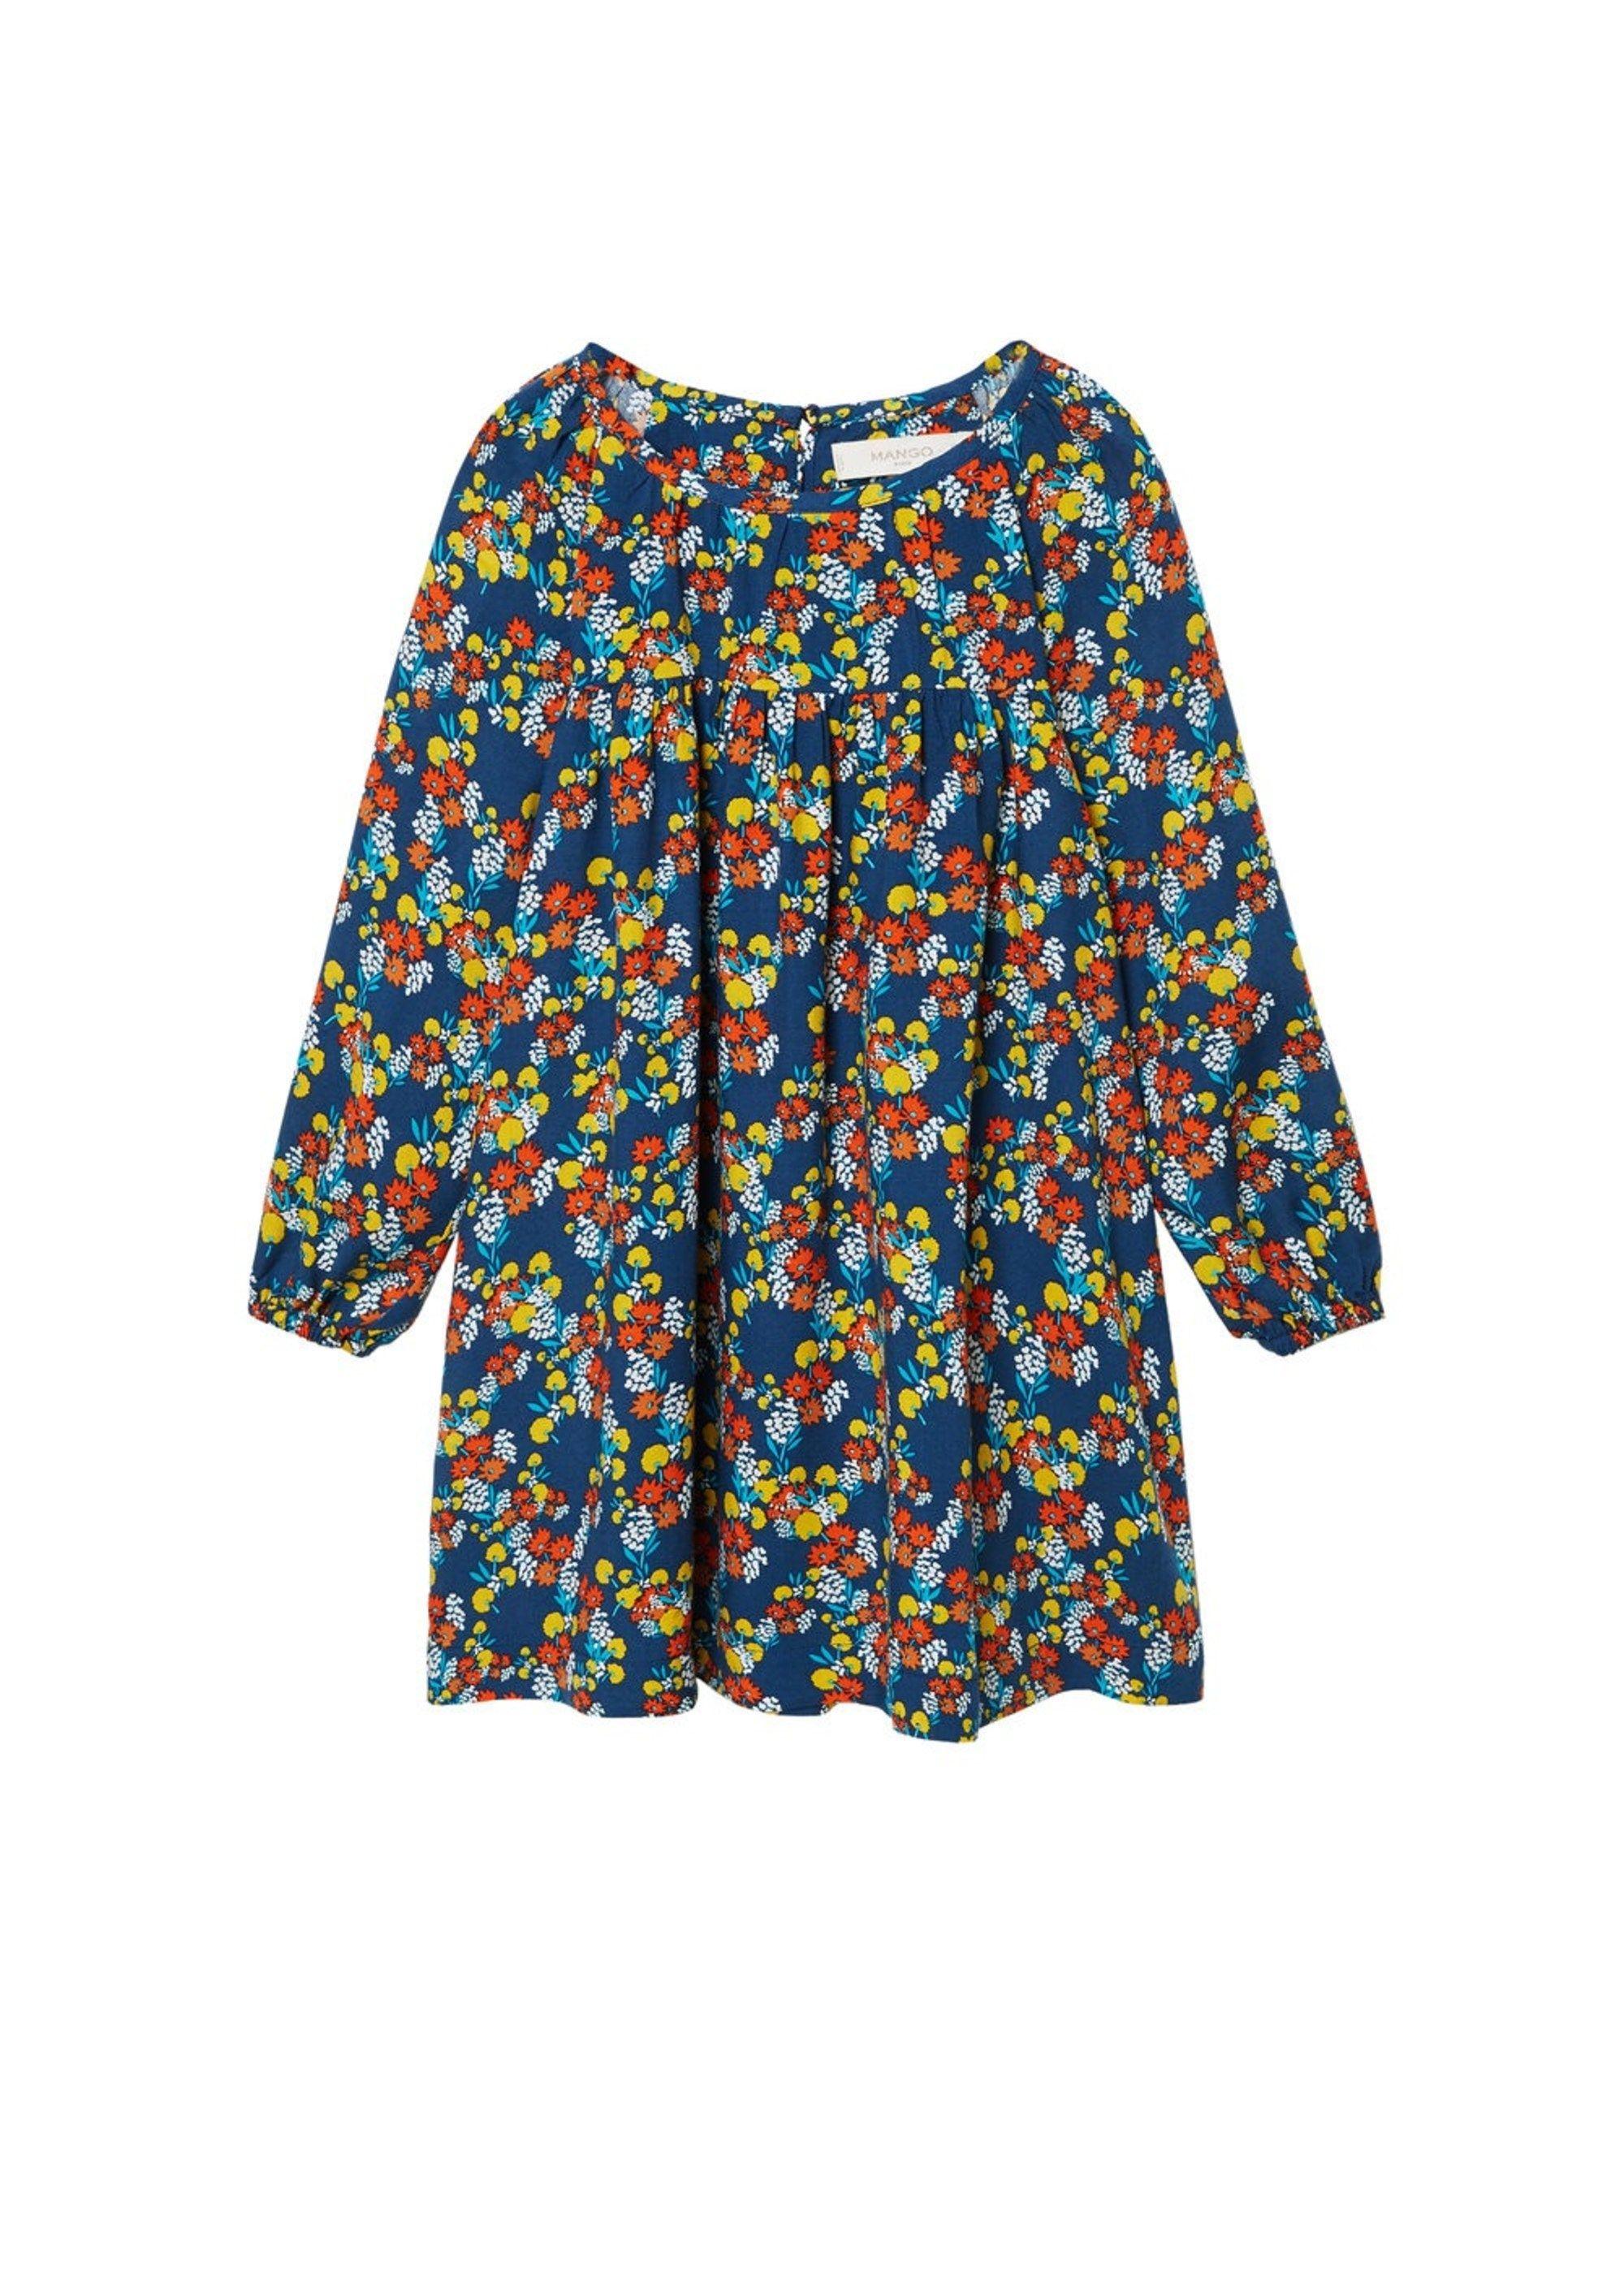 46e34e9325fa2 MANGO KinderMädchen Kleid Mont blau